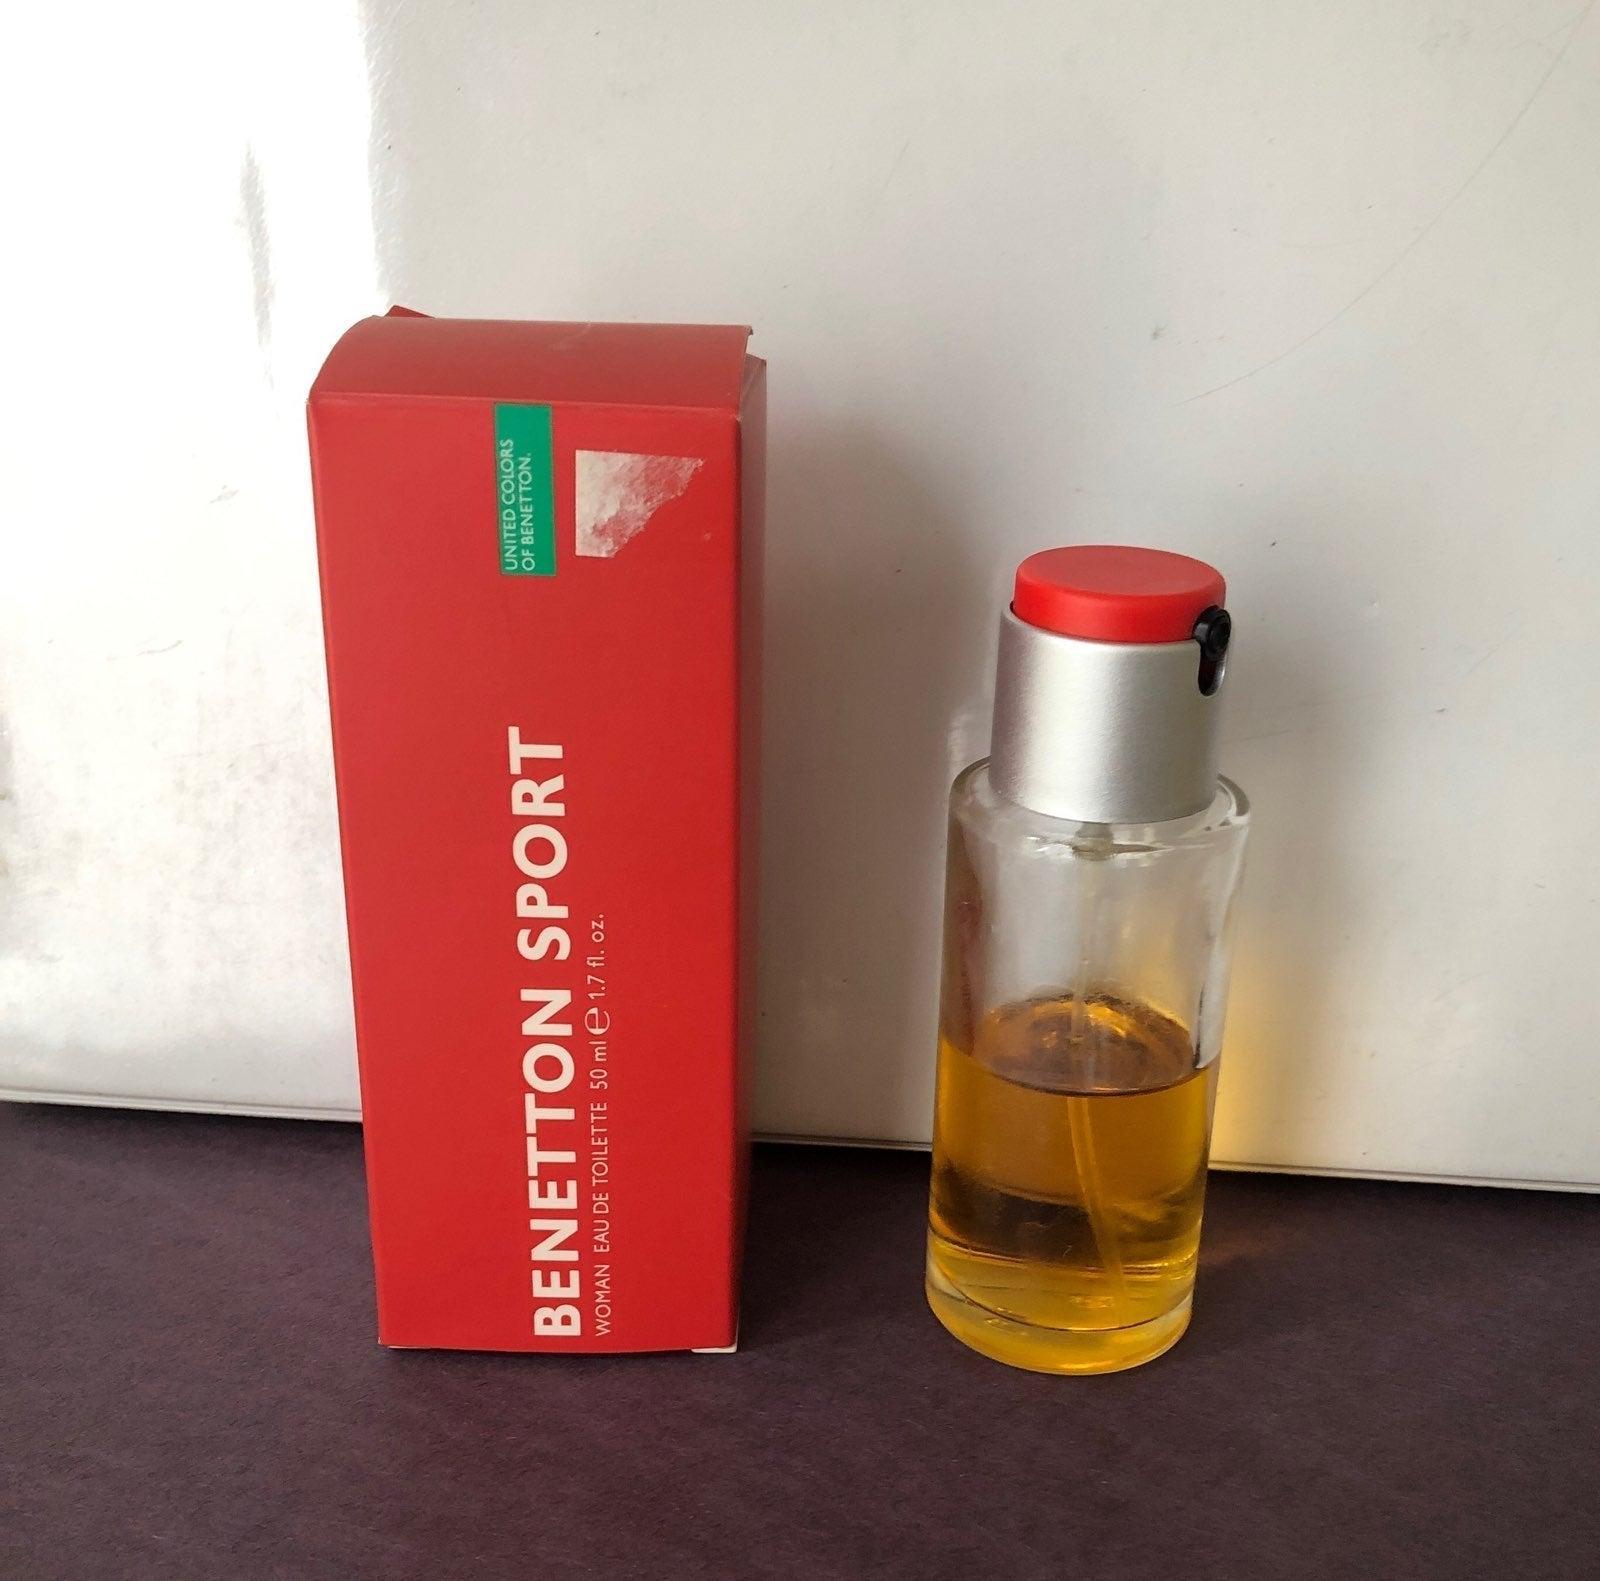 BENETTON SPORT women perfumes